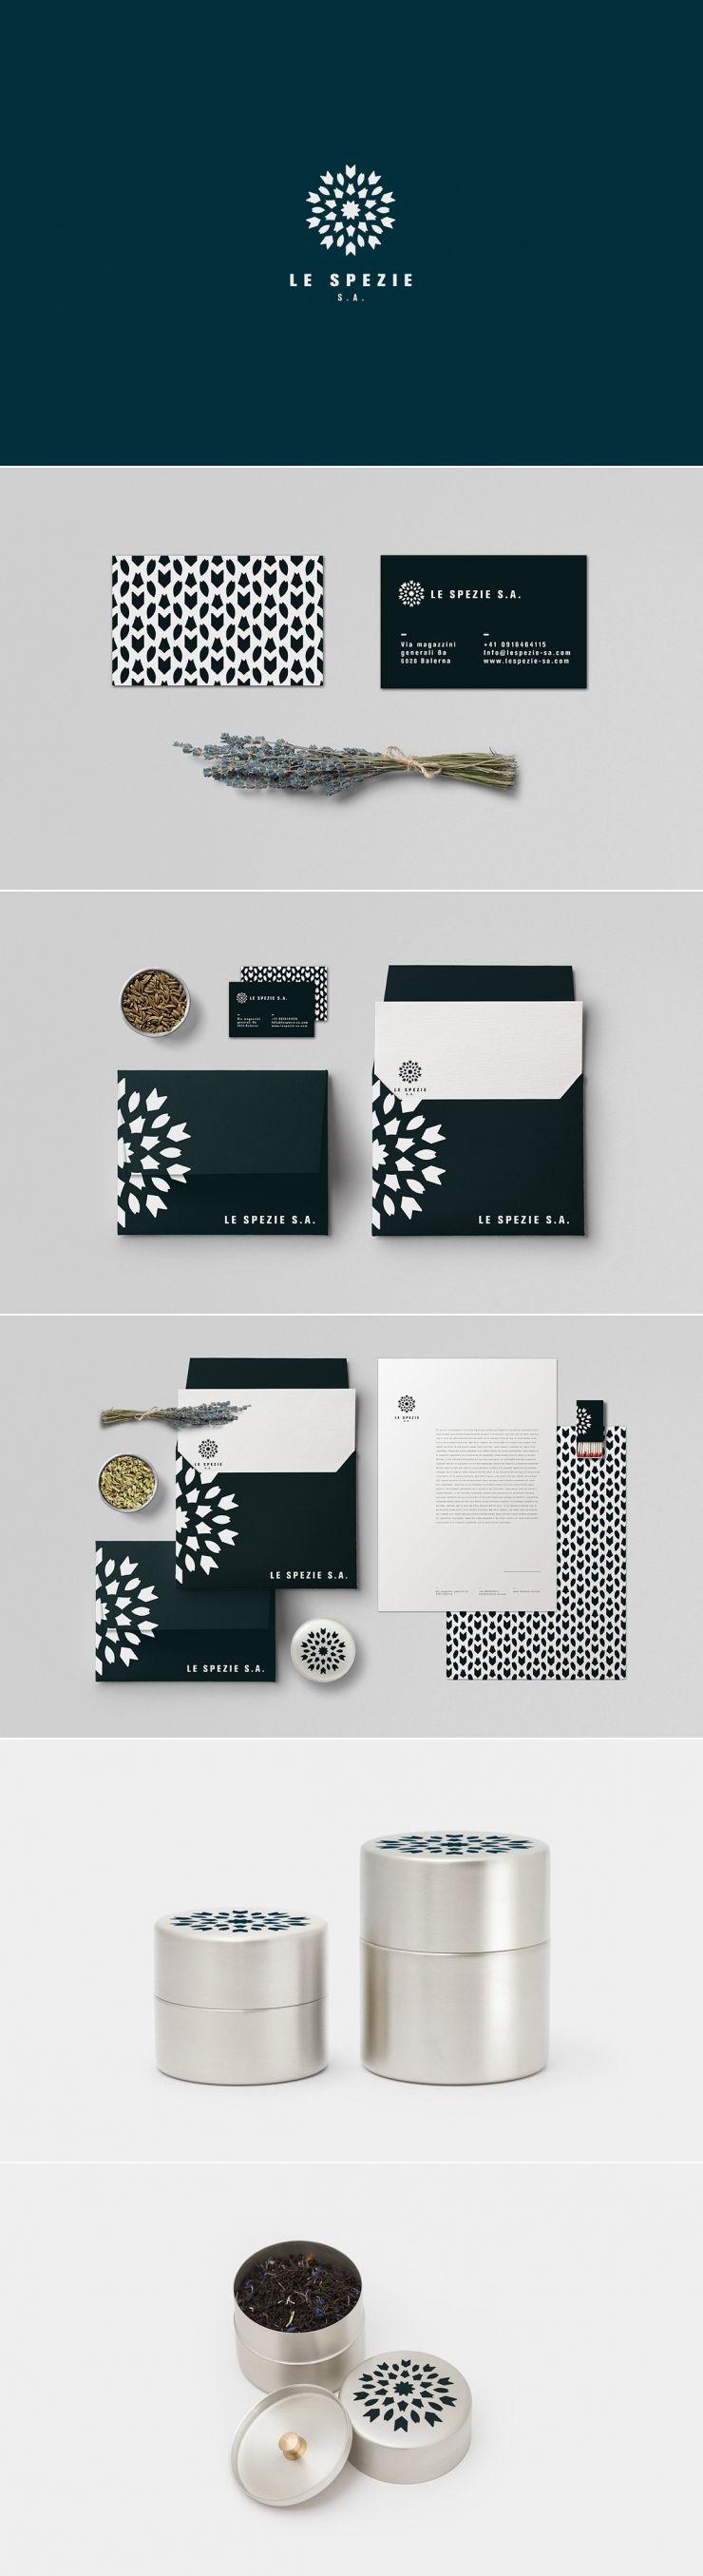 Le Spezie Spice Branding By Luca Minutilli Fivestar Branding Agency Design And Branding Corporate Identity Design Graphic Design Branding Creative Branding